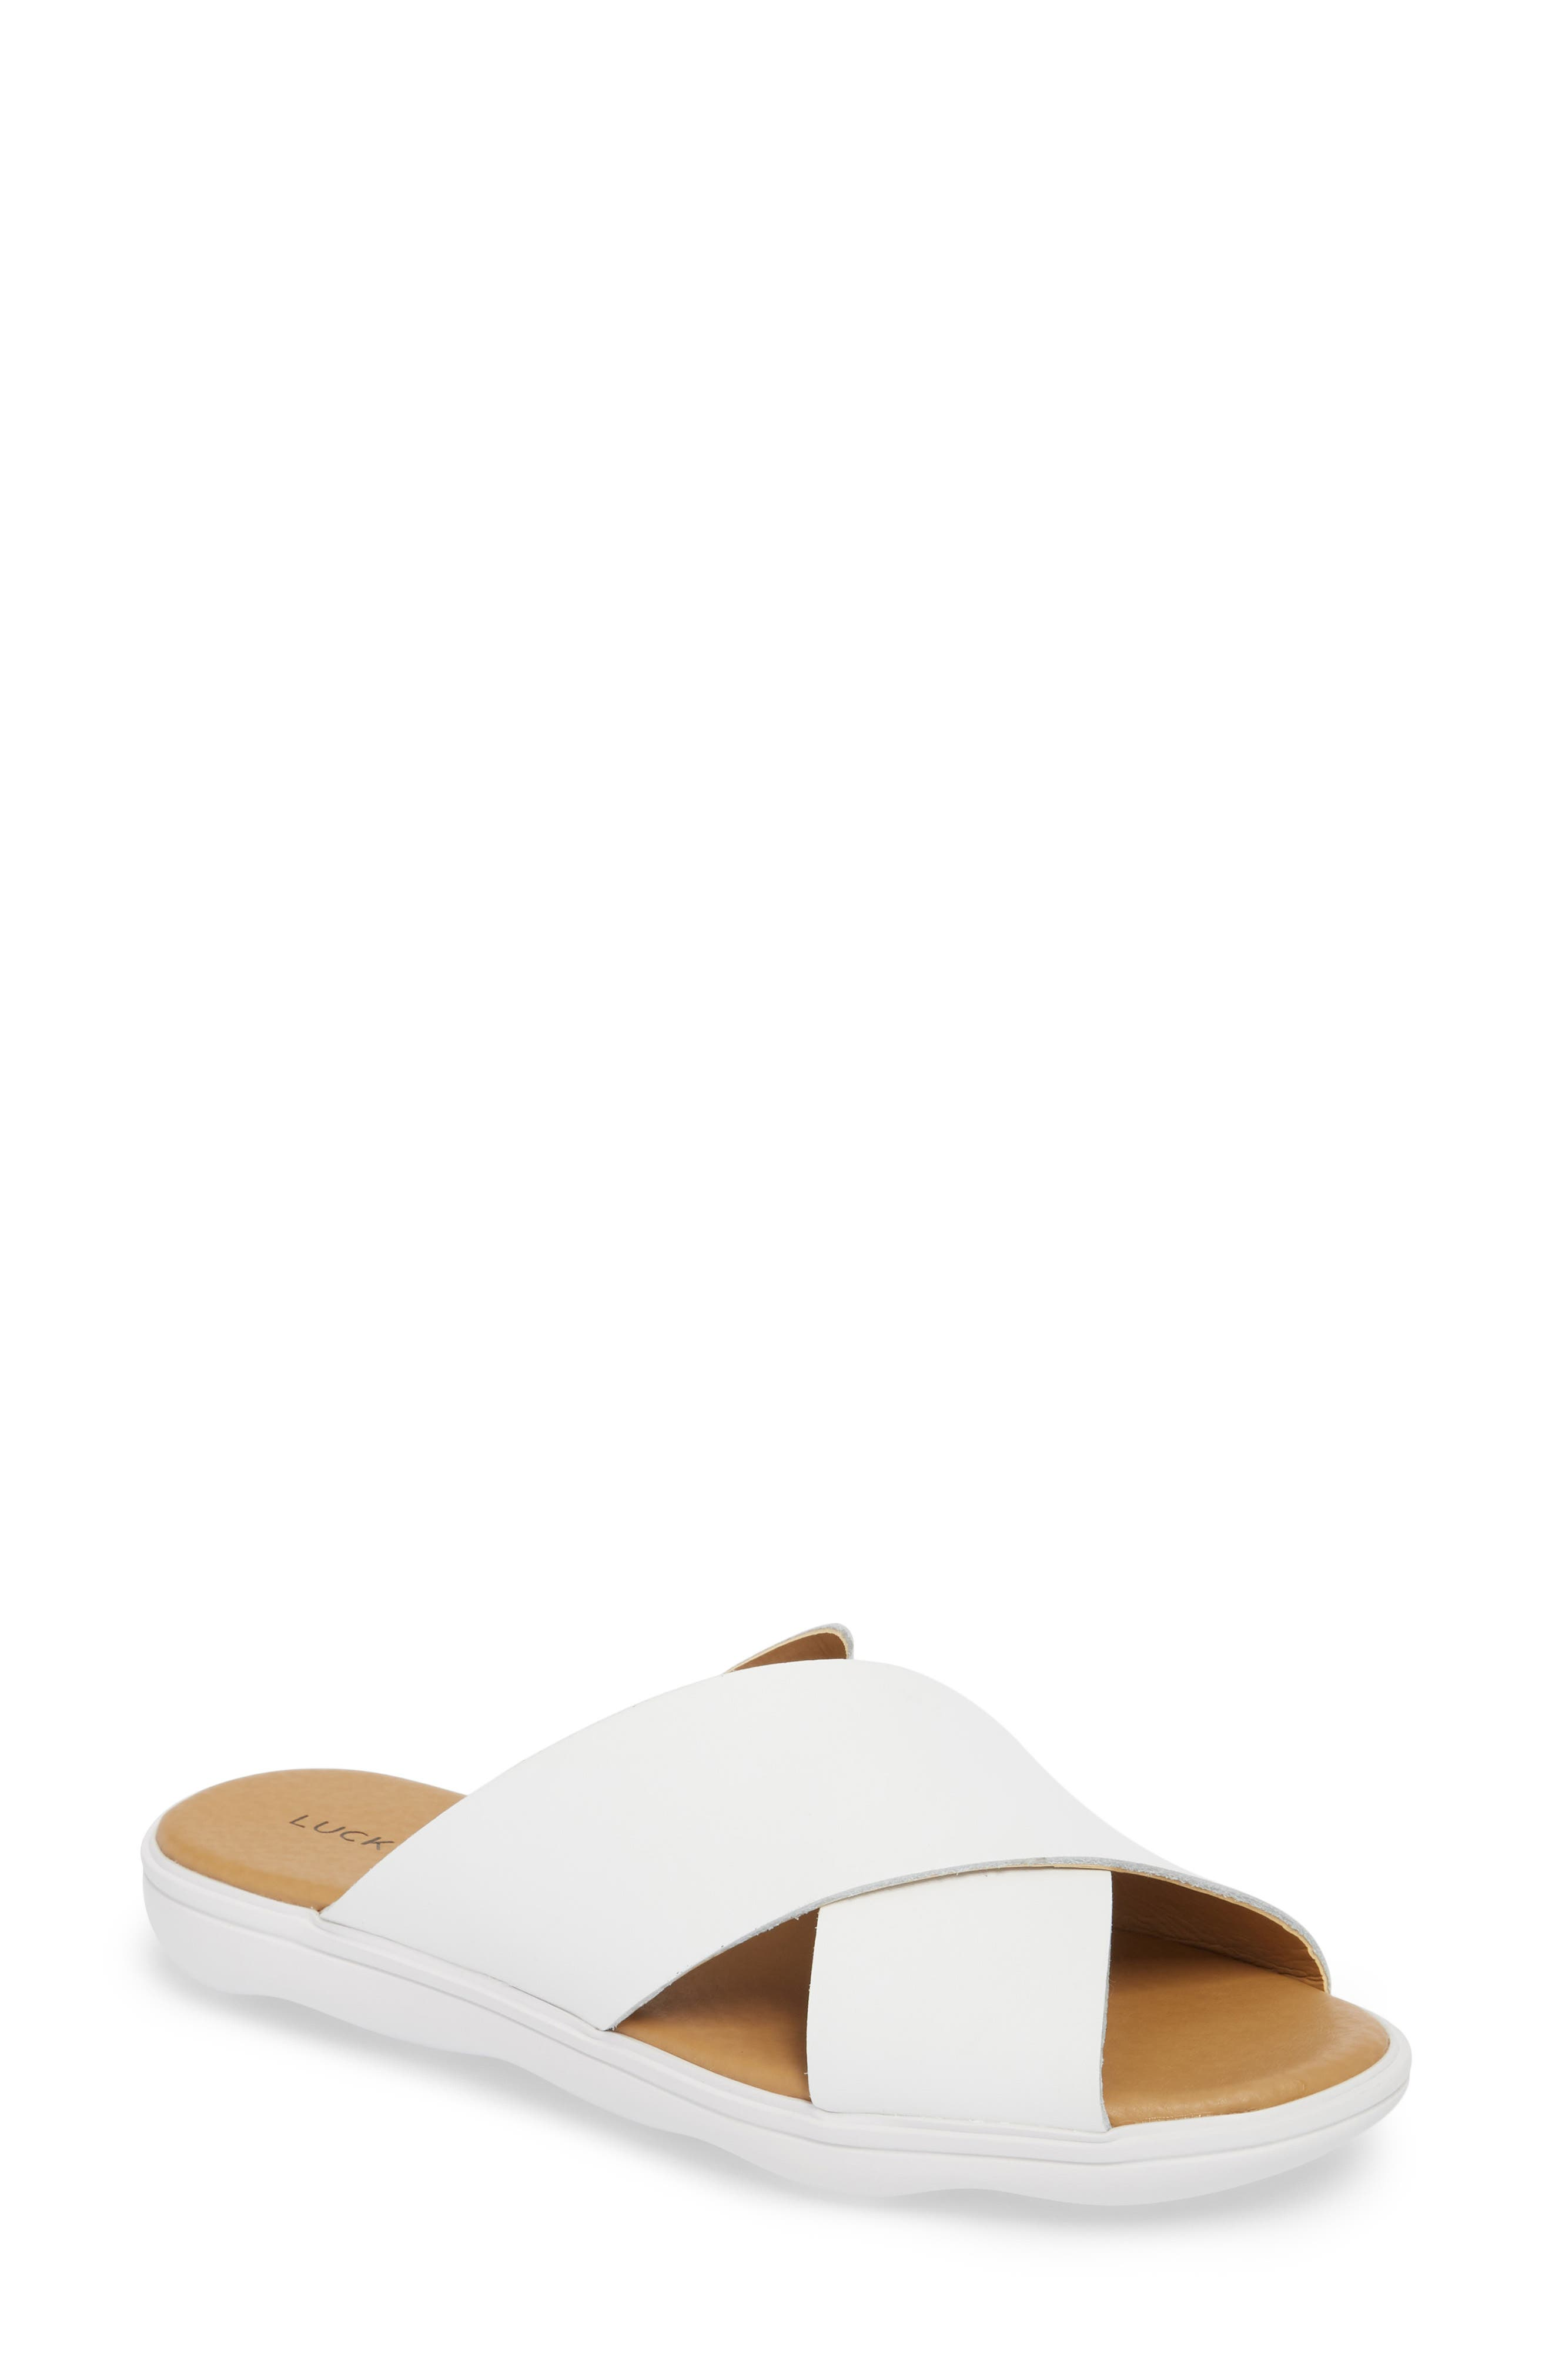 LUCKY BRAND Mahlay Slide Sandal, Main, color, 110